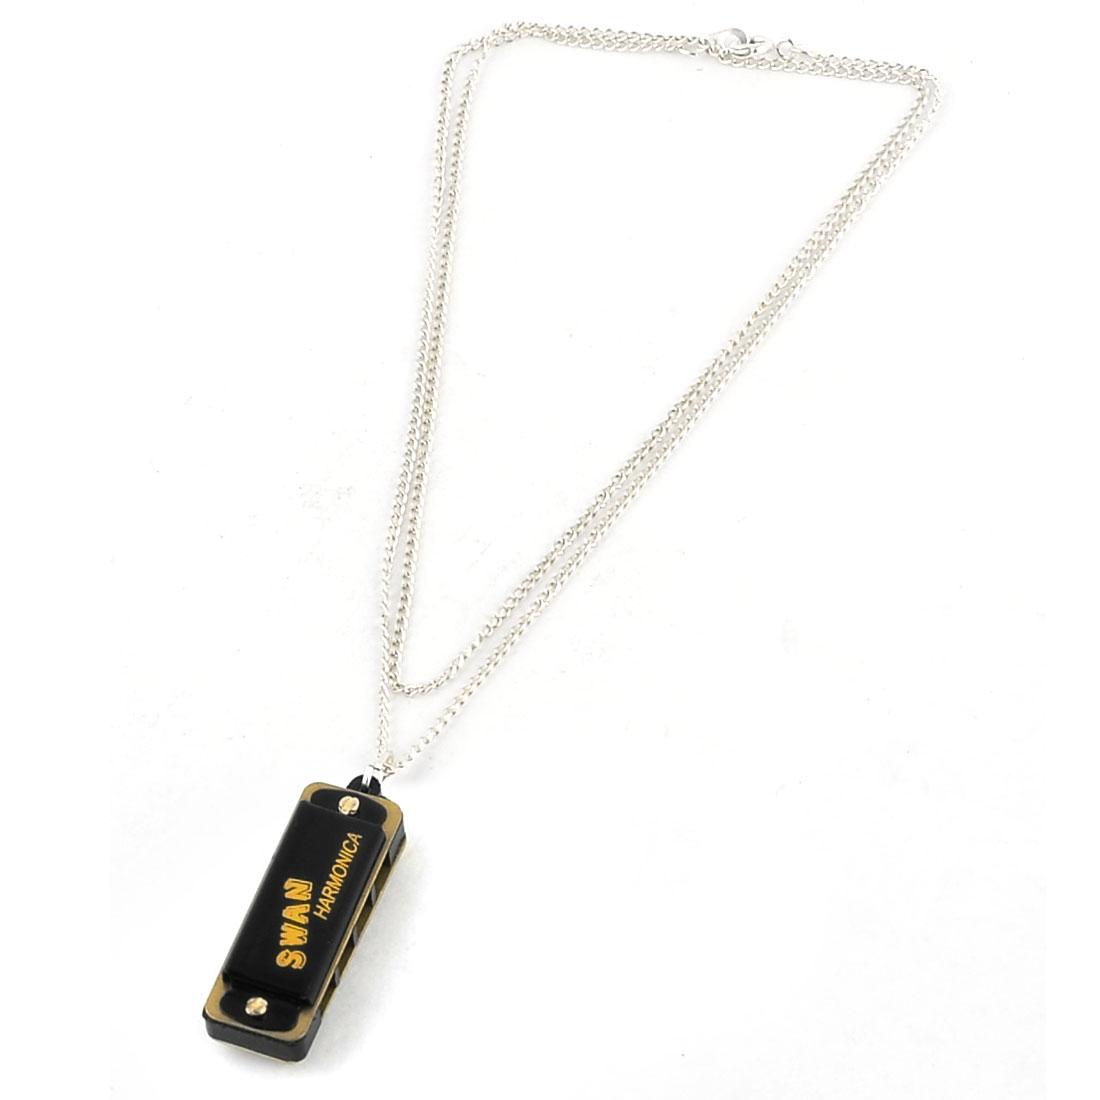 Lady Silver Tone Chain Black Harmonica Pendant Necklace